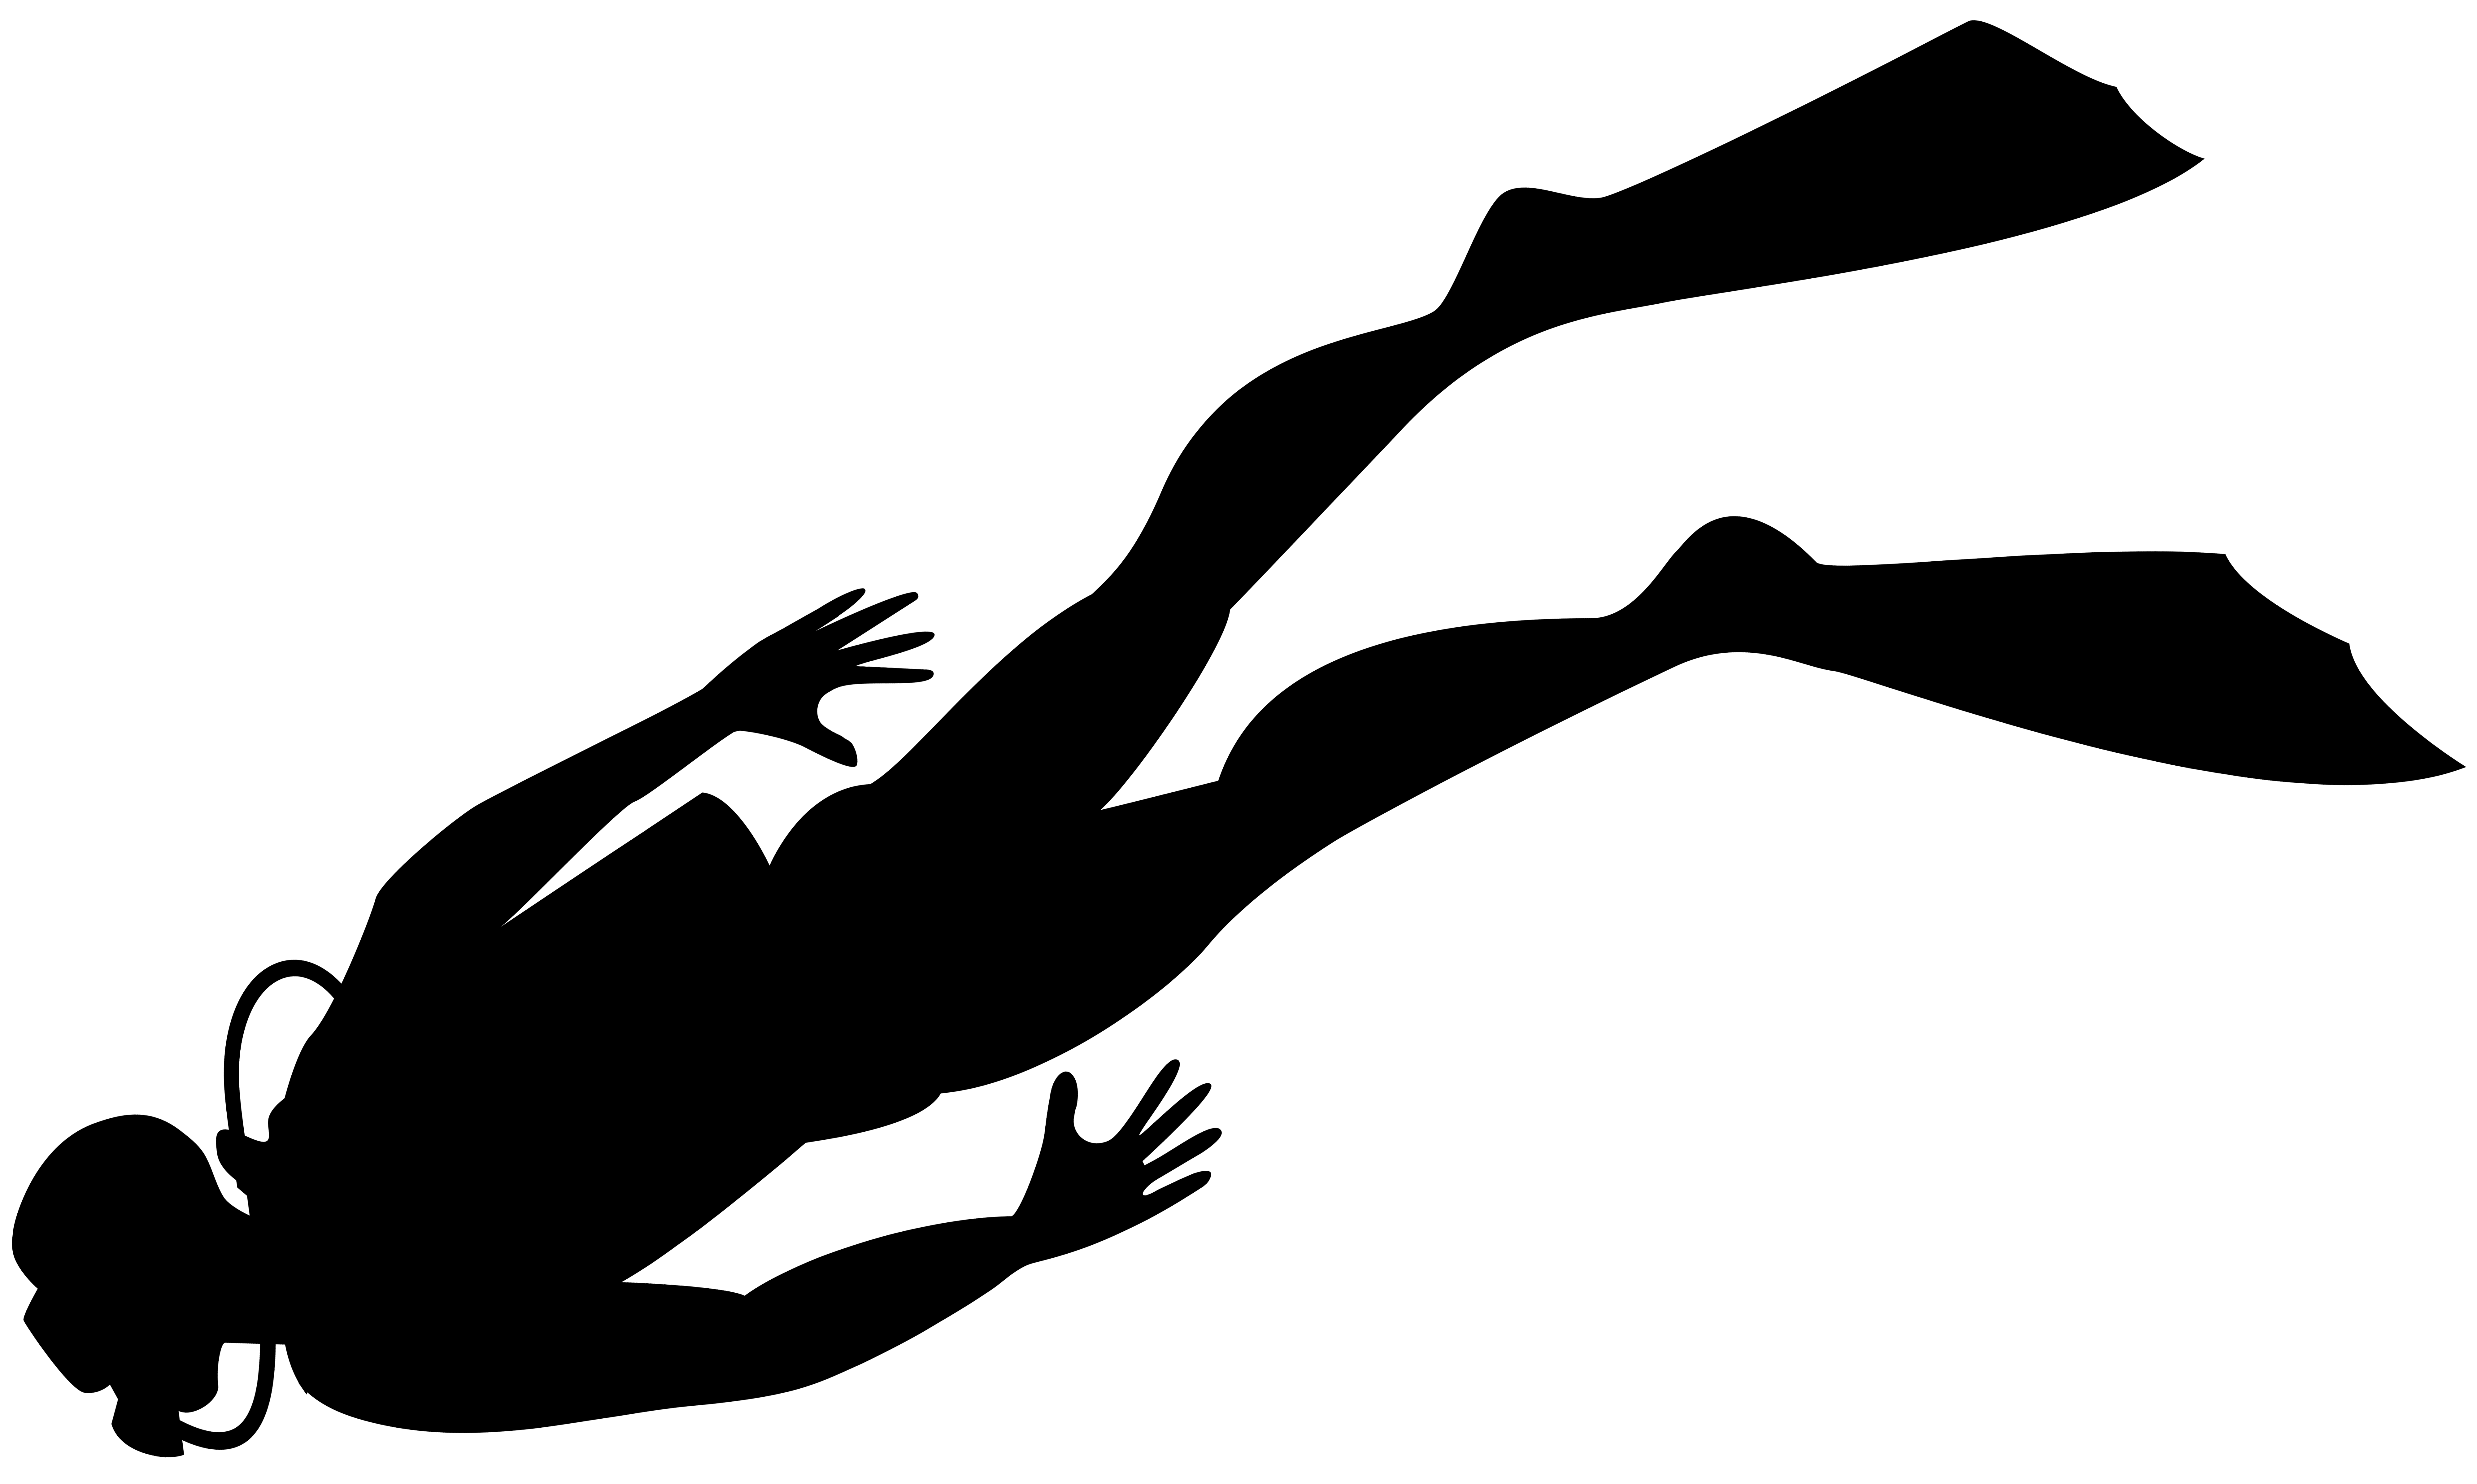 8000x4793 Scuba Diver Silhouette Png Clip Art Imageu200b Gallery Yopriceville